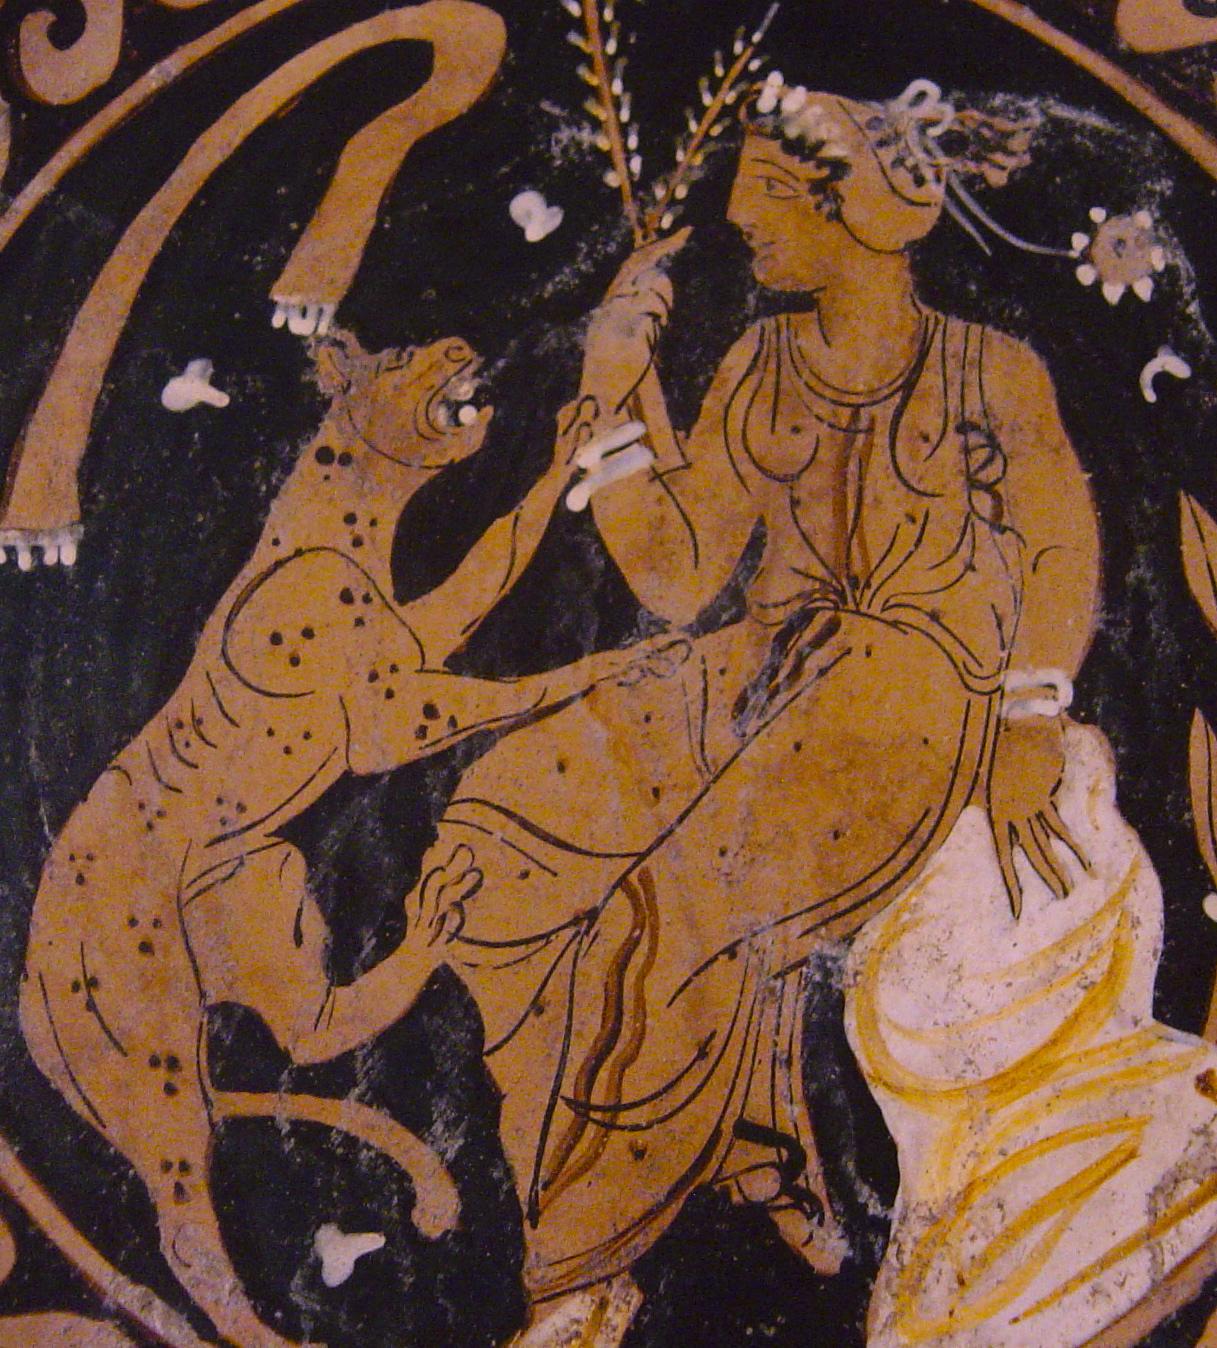 Photo of plate-apulia-magna-grecia-redweare-with-cat